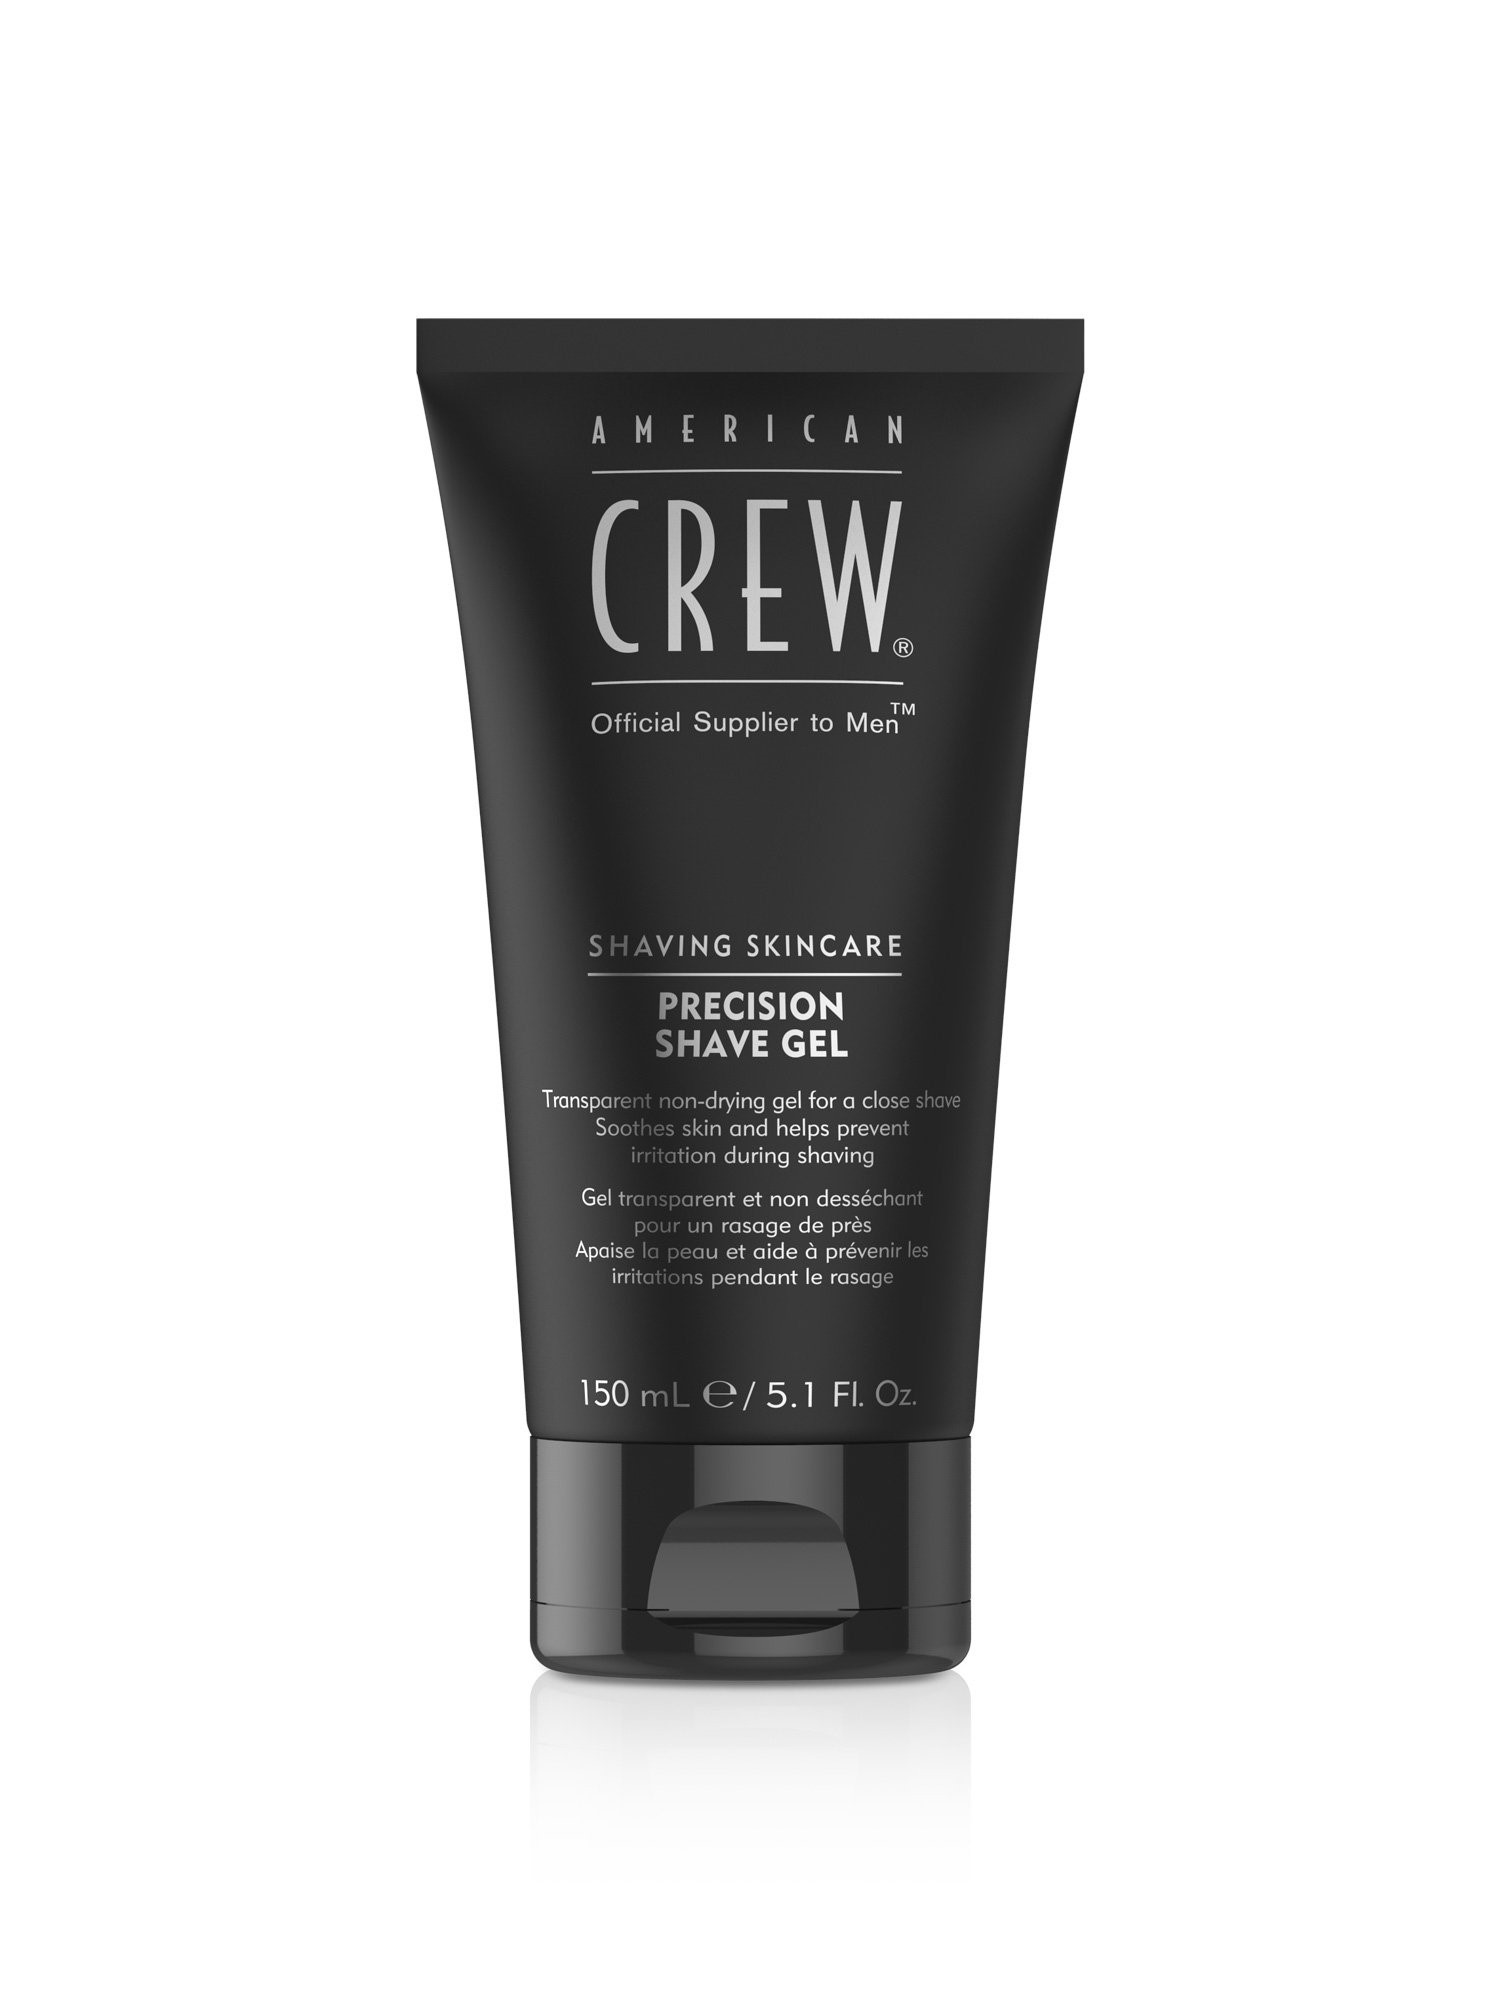 American Crew Precision Shave Gel 5.1oz